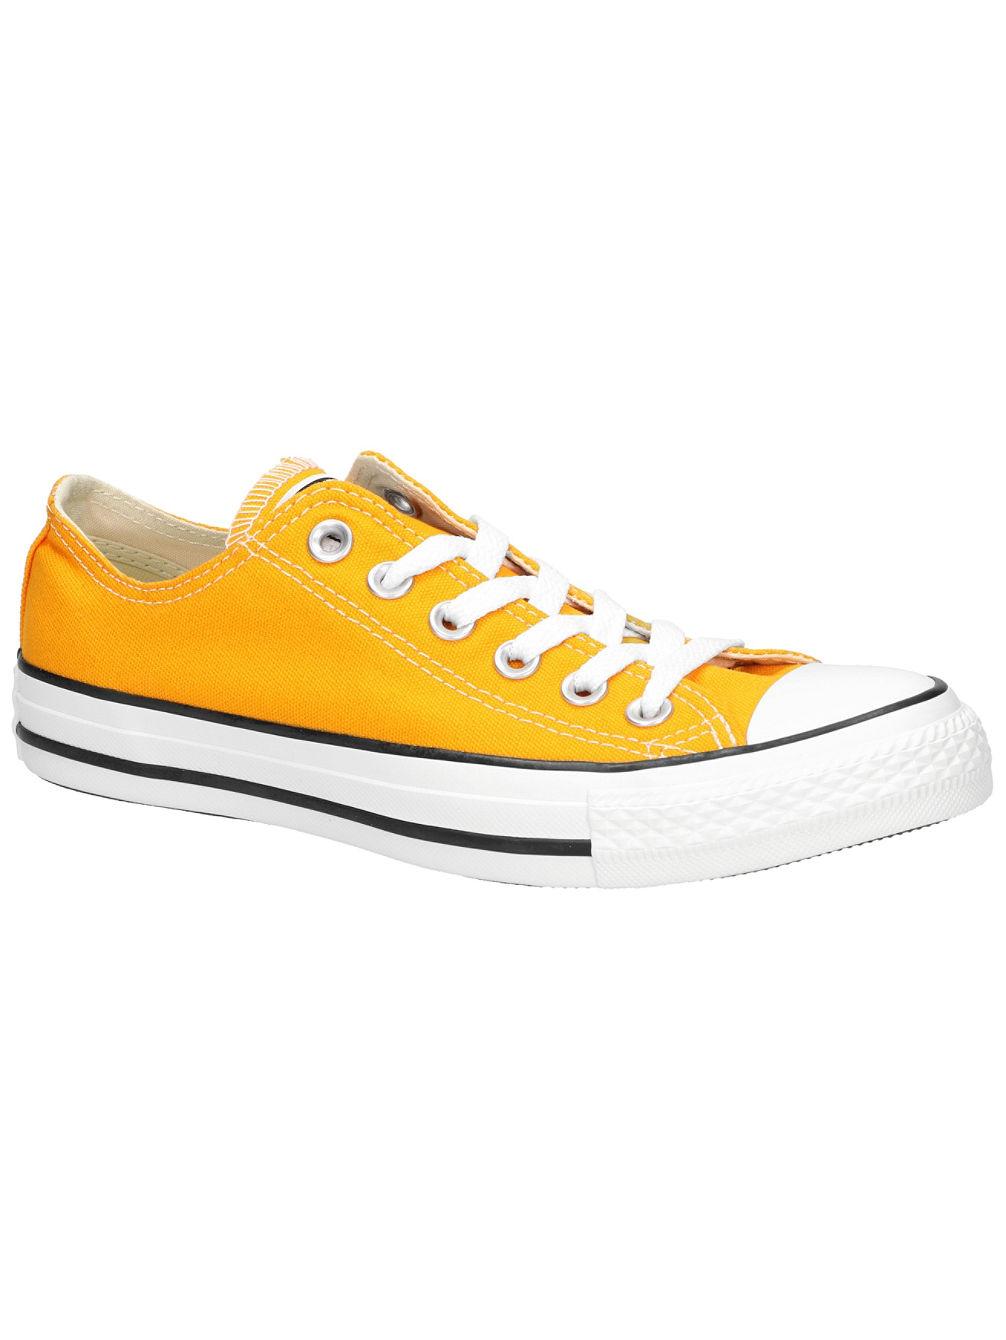 Buy Converse Chuck Taylor All Star Sneakers Women online at blue ... b92b91b55